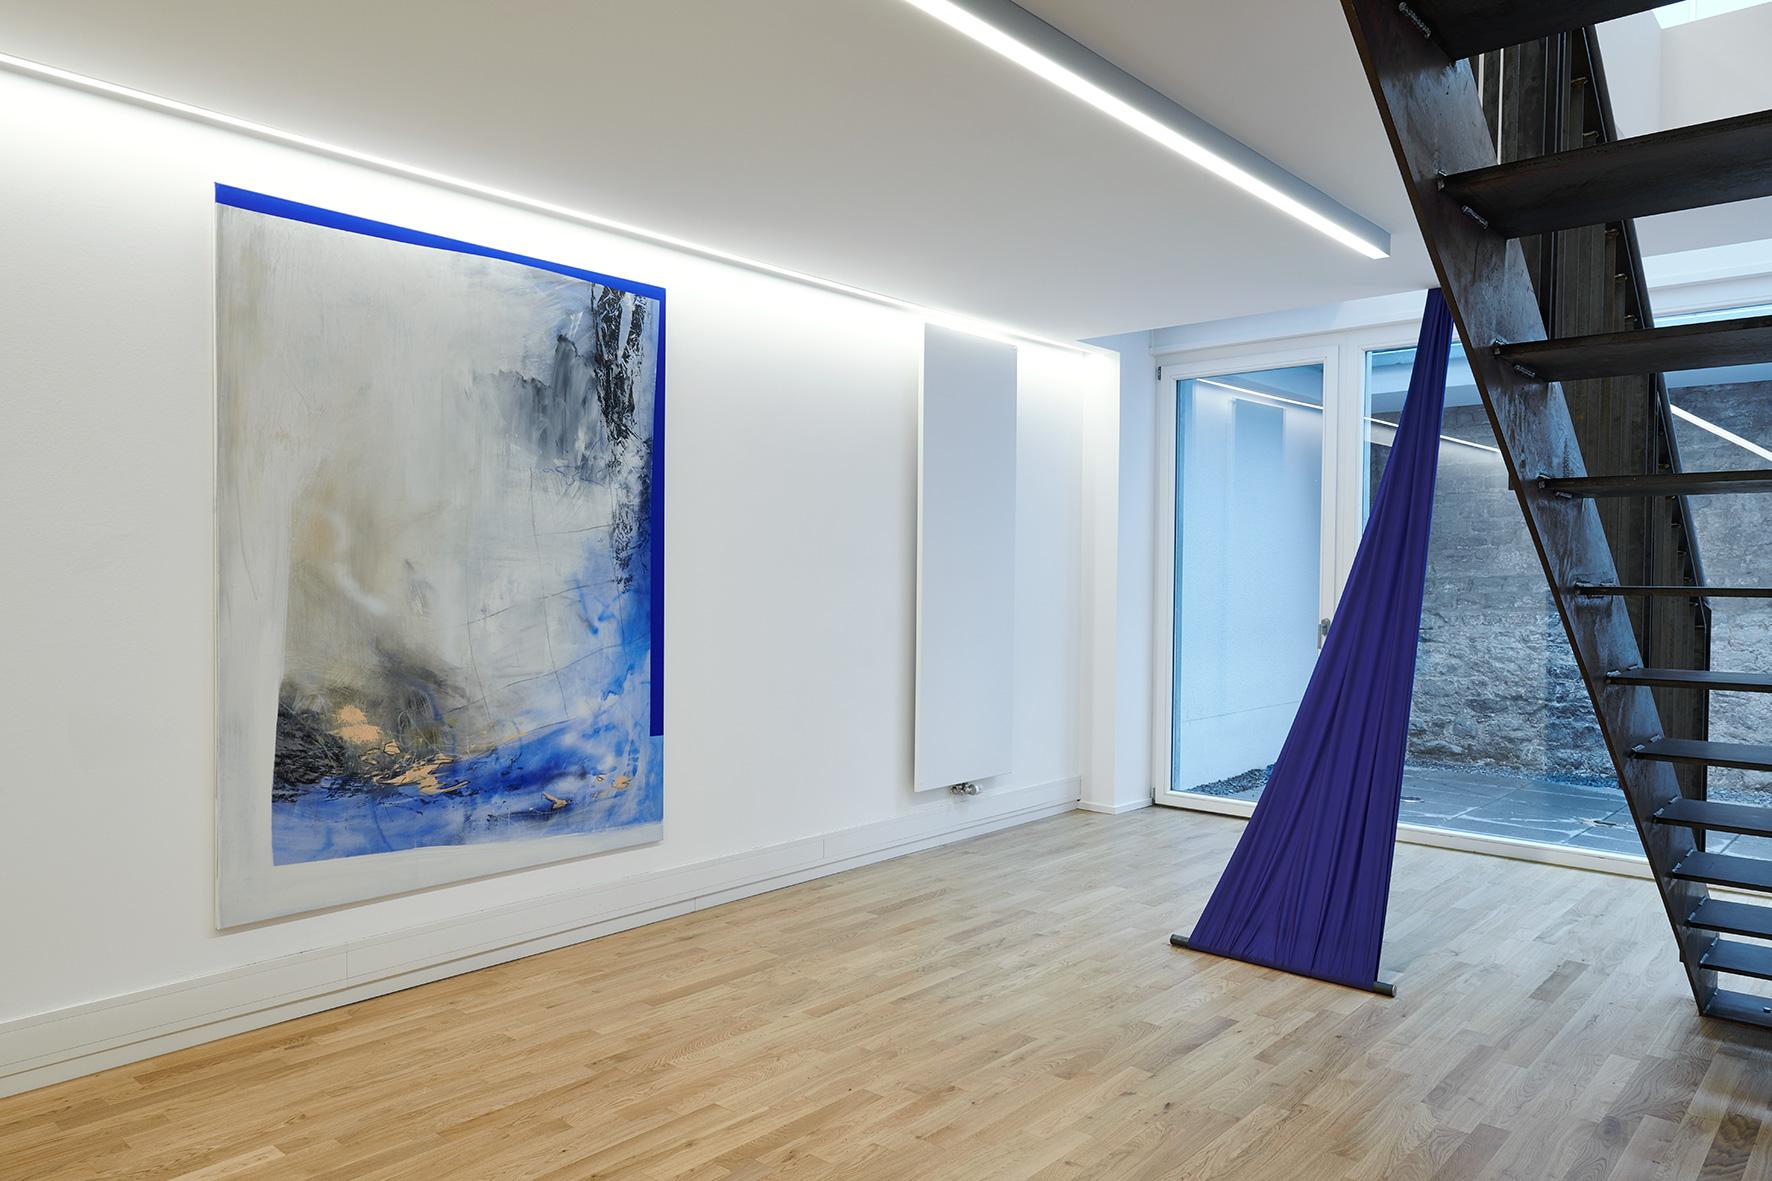 2019.05.08_Galerie-Alber_27.web.jpg